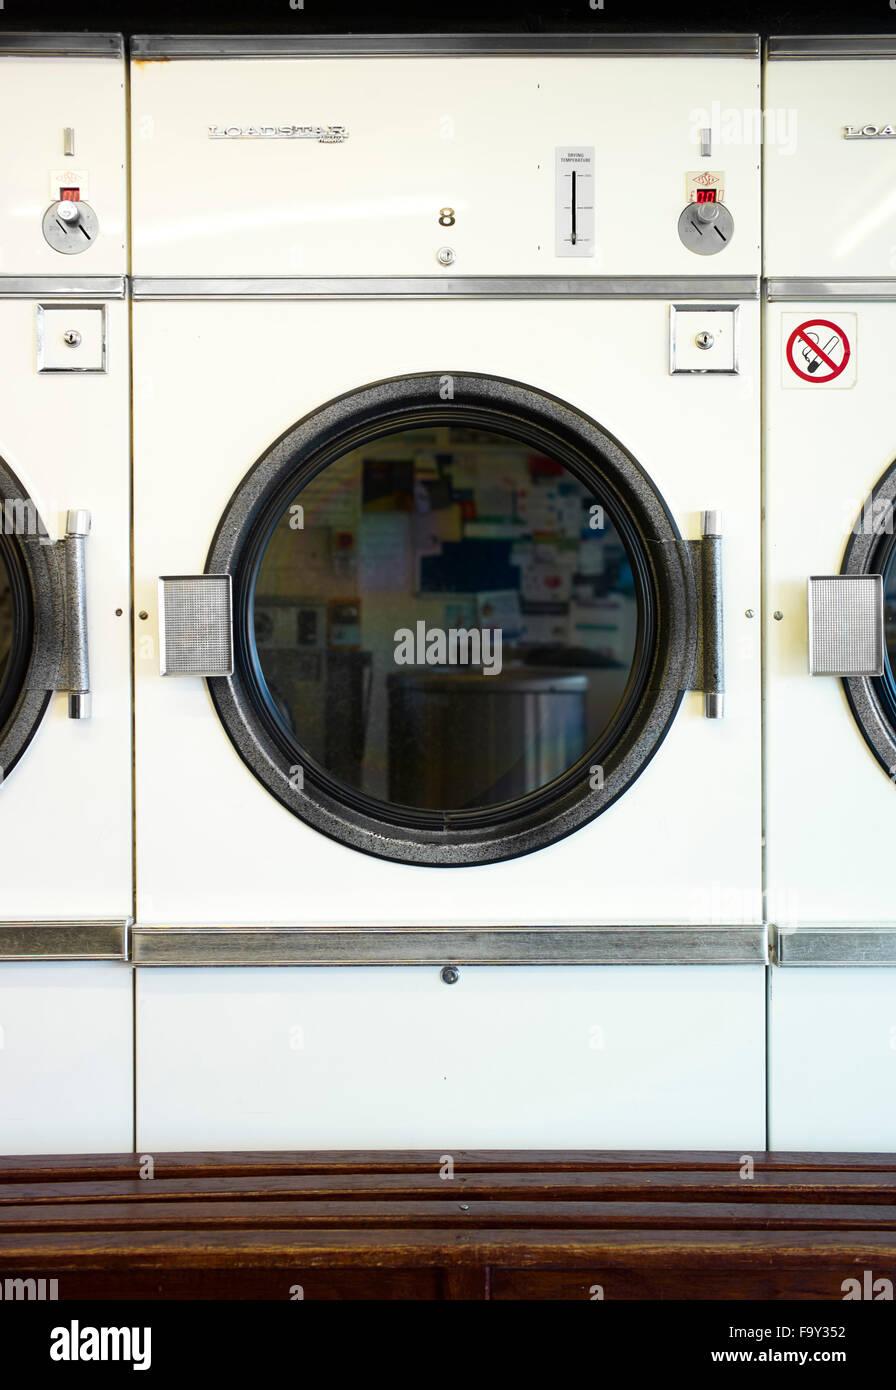 Loadstar drying machine in laundrette - Stock Image